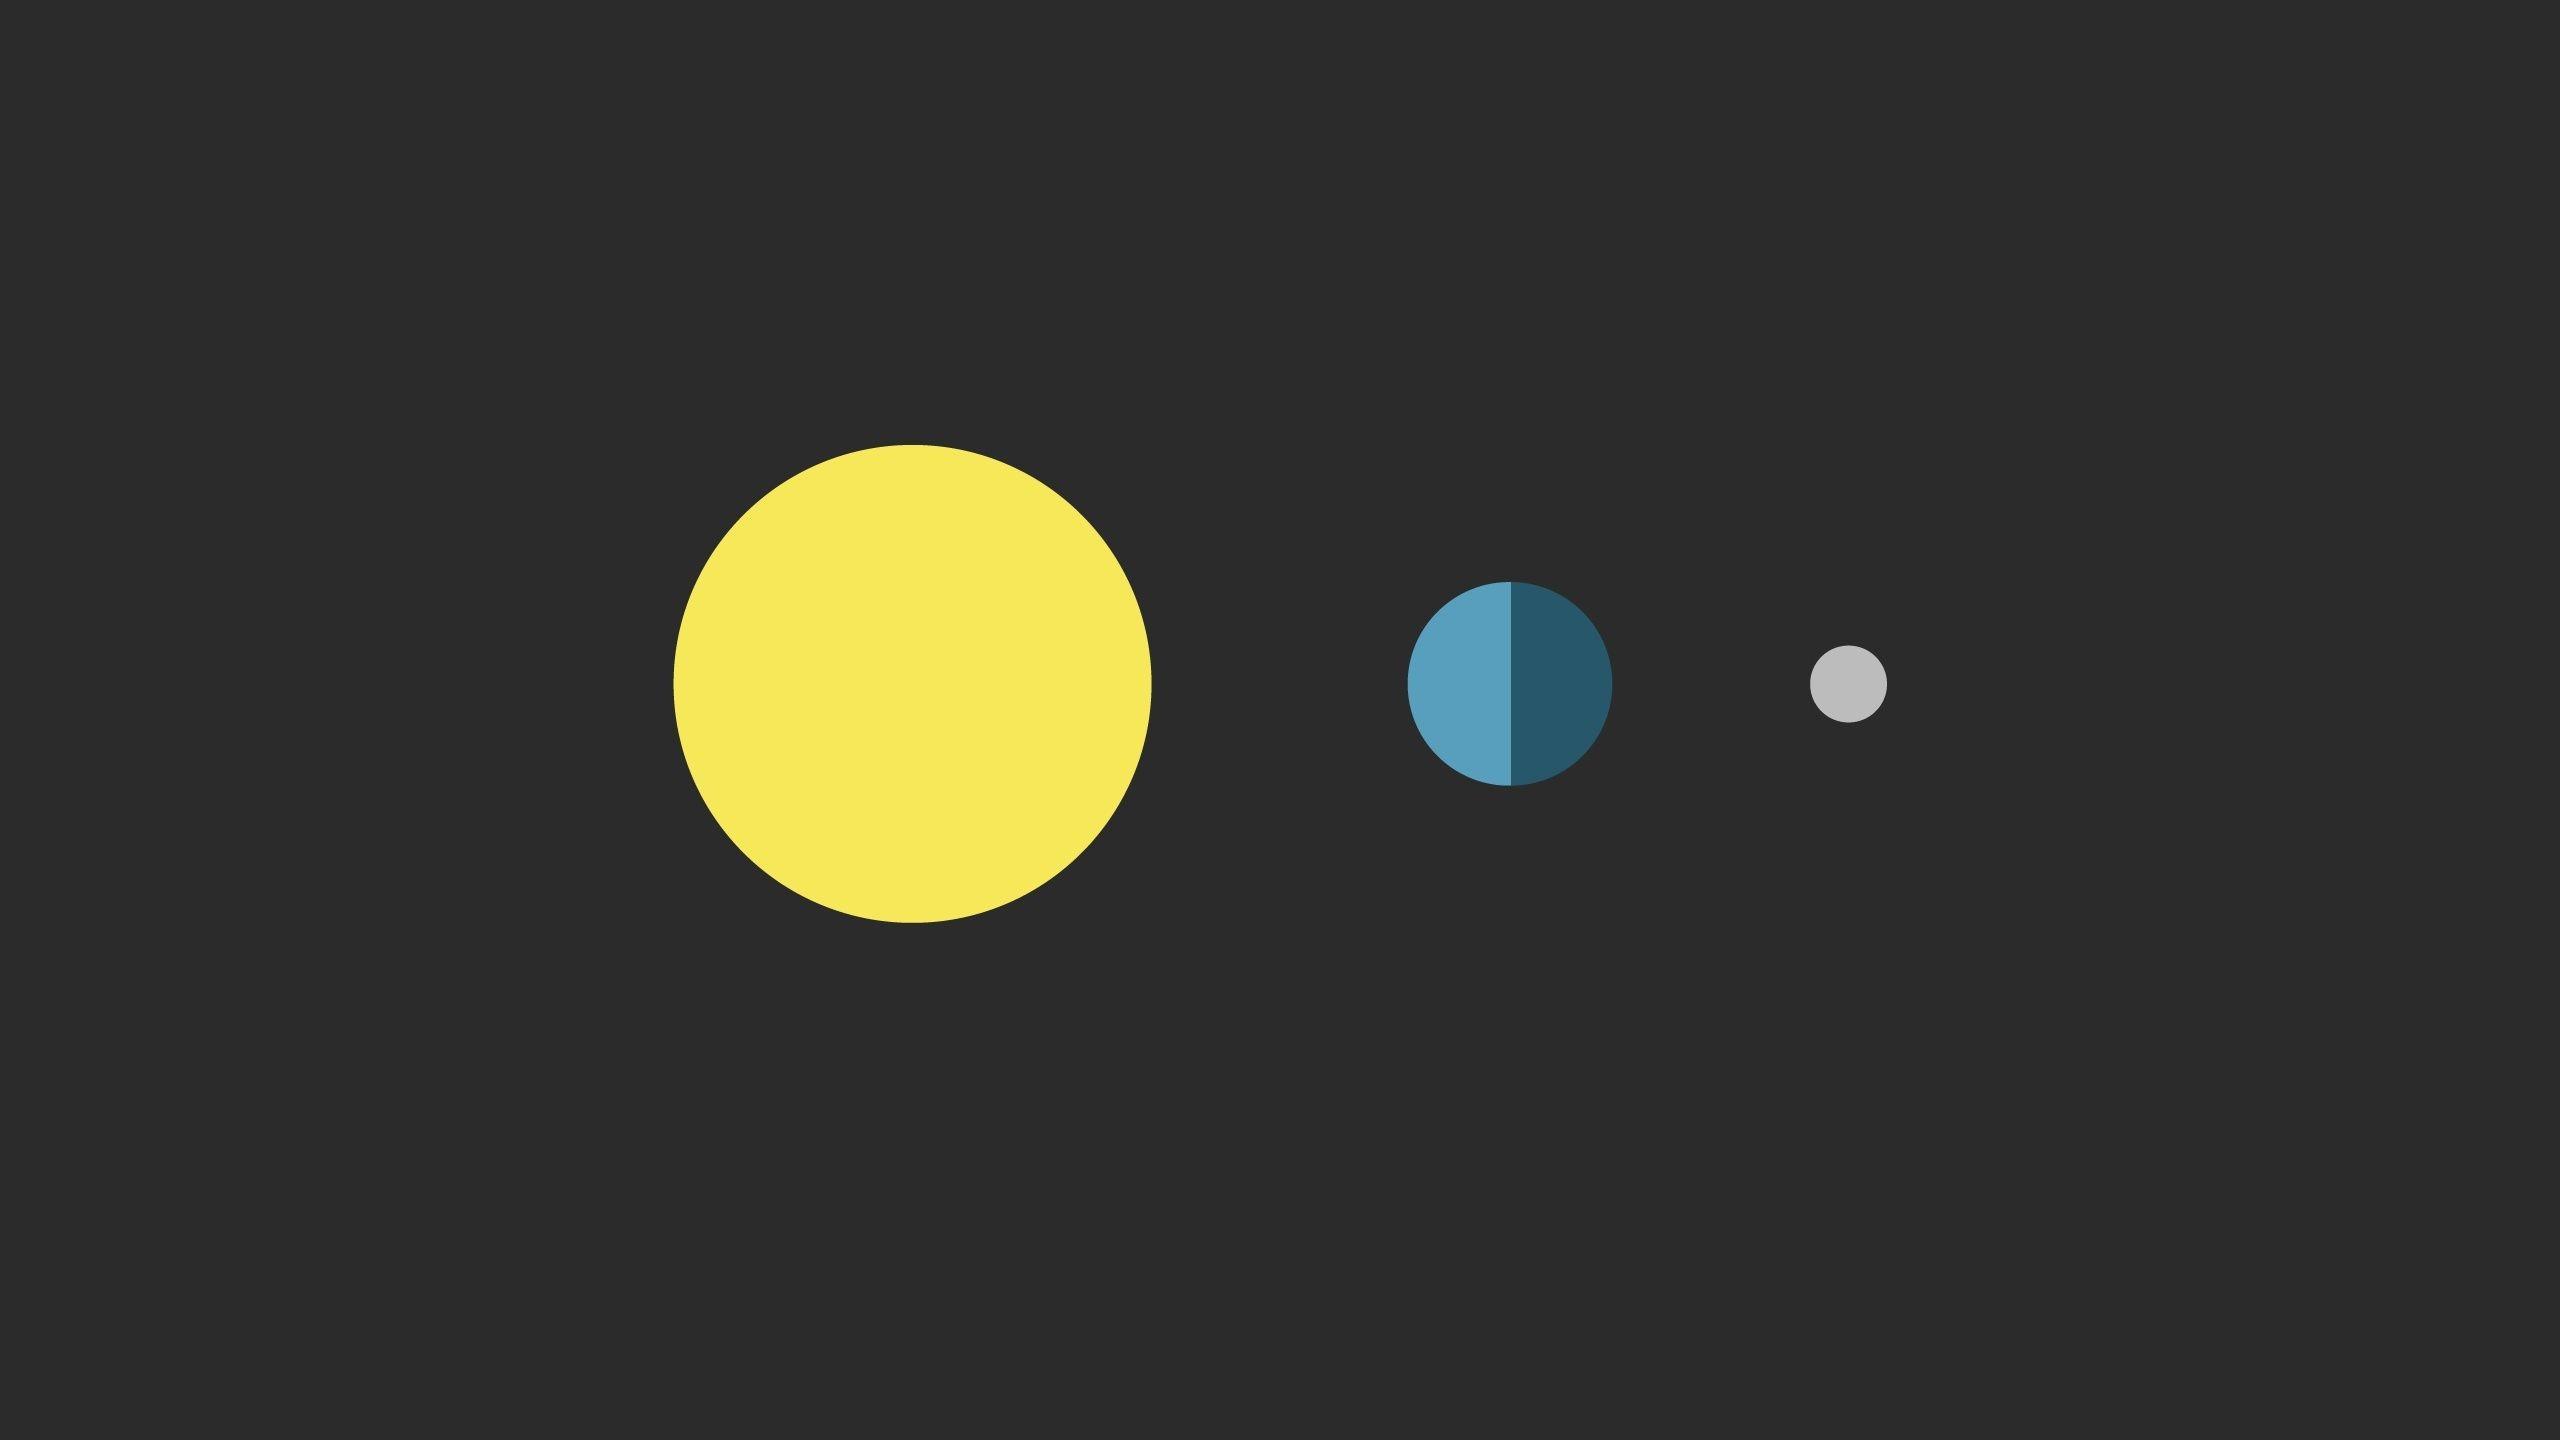 Sun Earth Moon desktop PC and Mac wallpaper